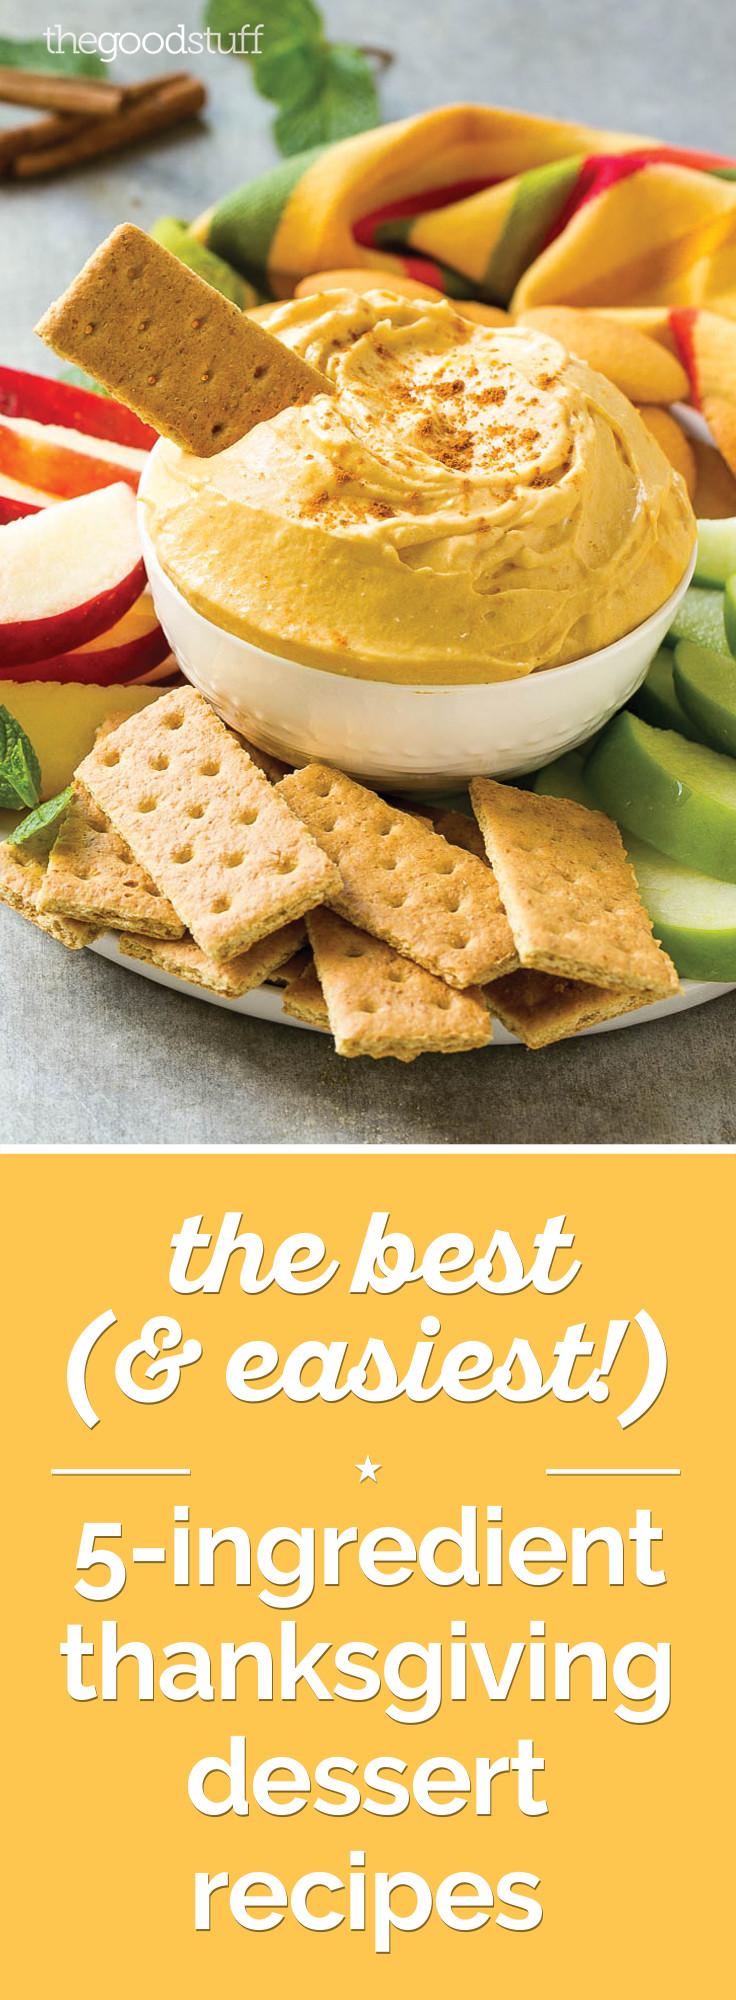 Easy Thanksgiving Pies  The Best & Easiest 5 Ingre nt Thanksgiving Dessert